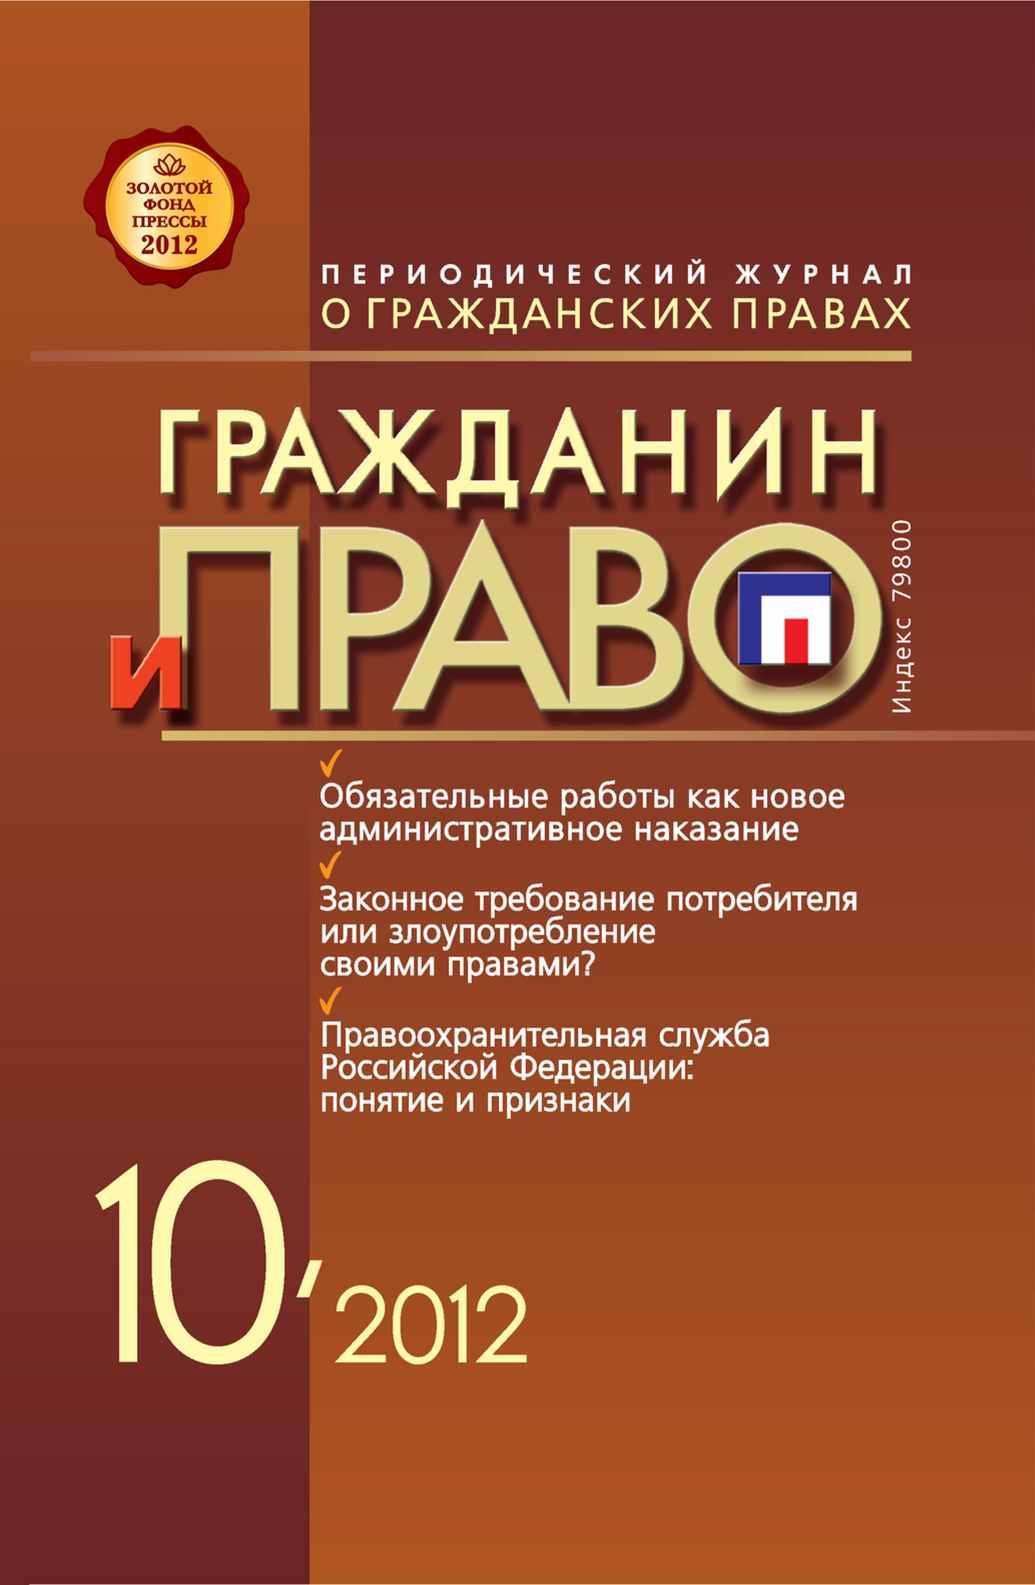 Гражданин и право №10/2012